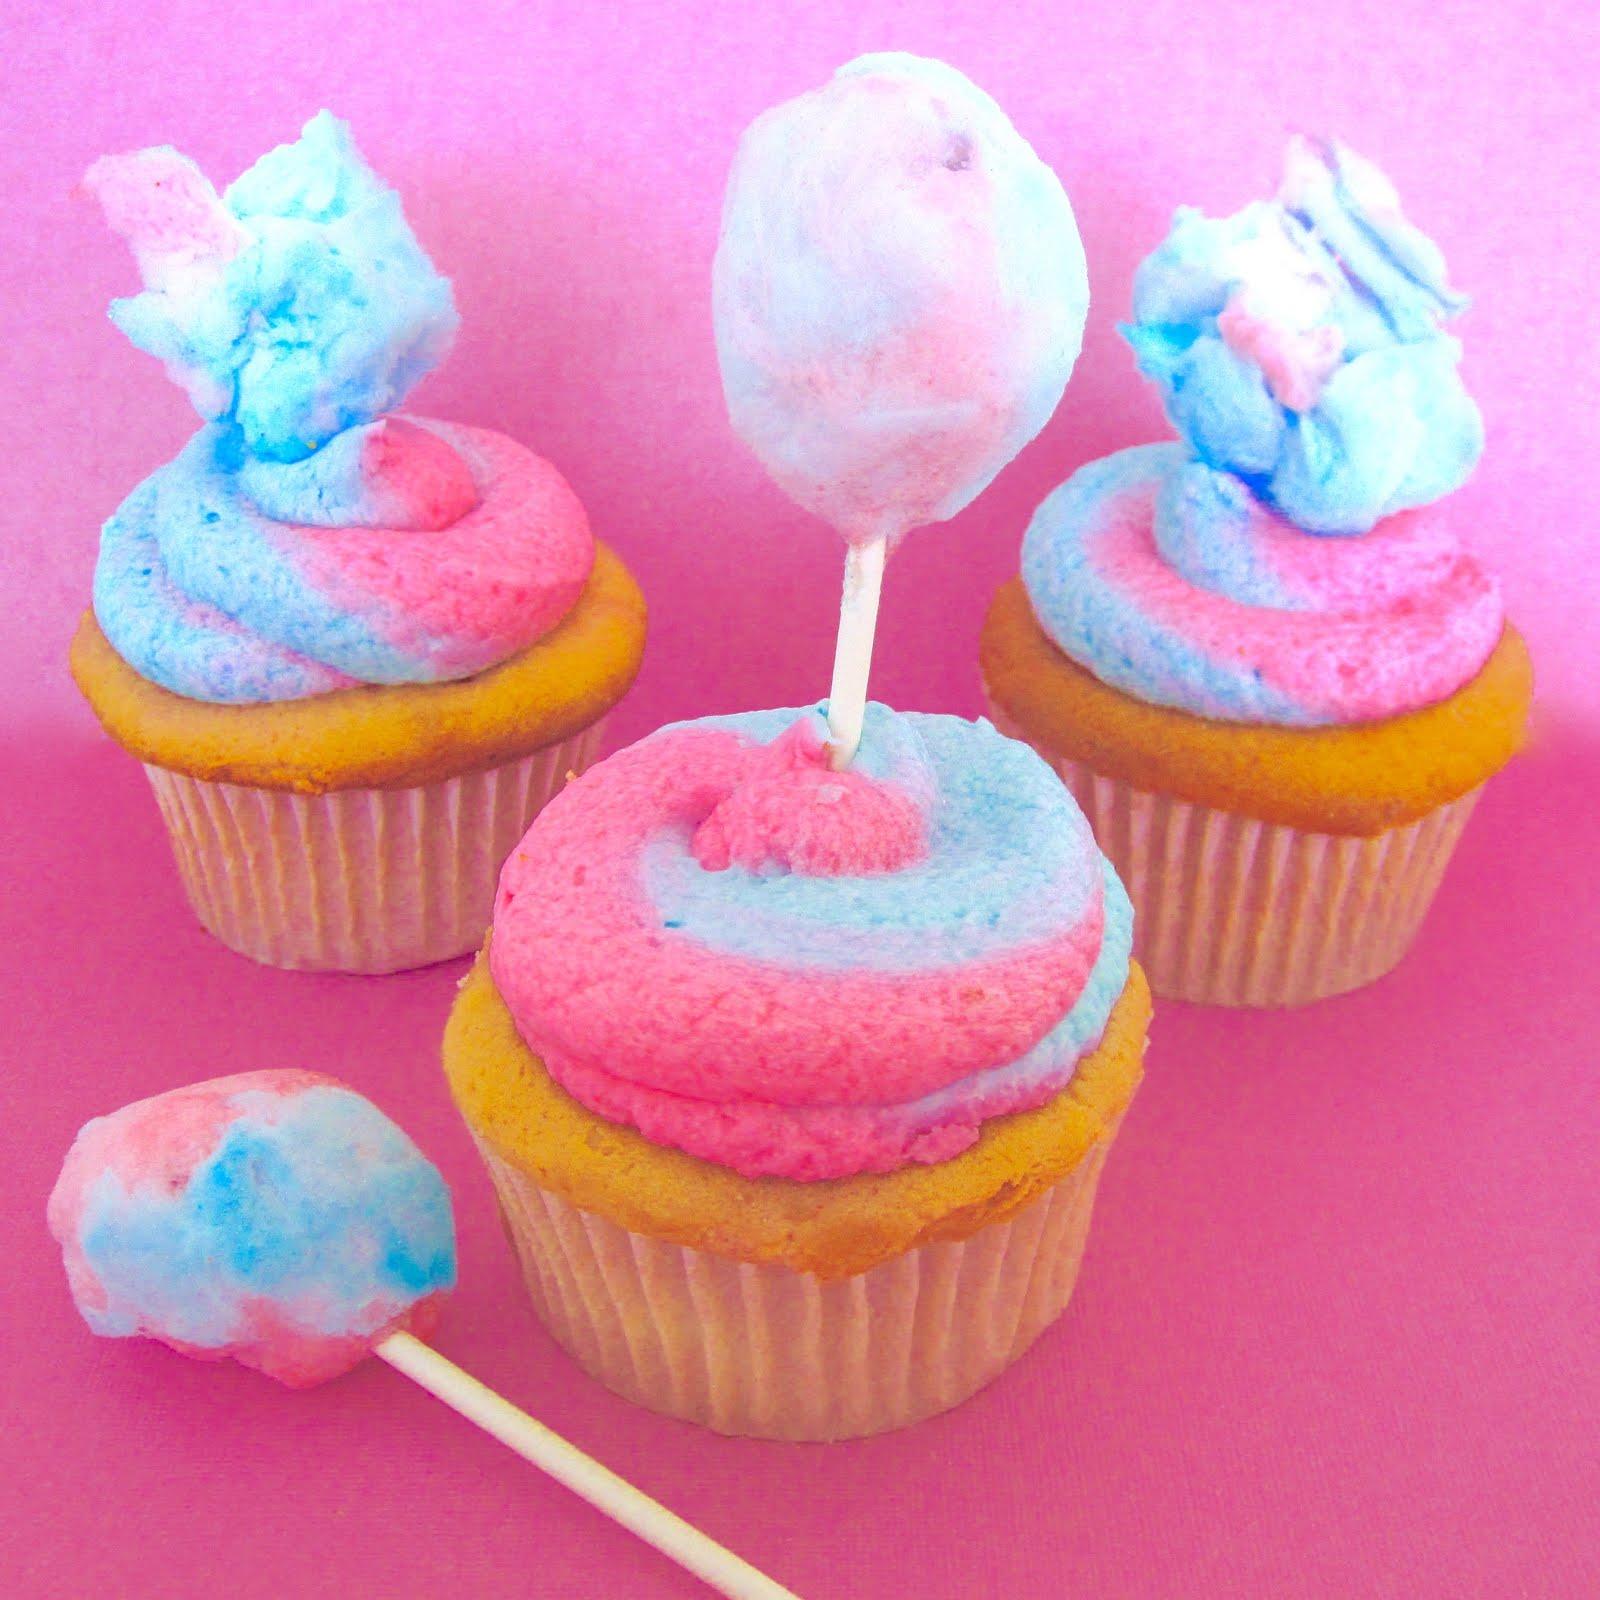 {VIDEO} Mini Cotton Candy Lollipops - The Lindsay Ann